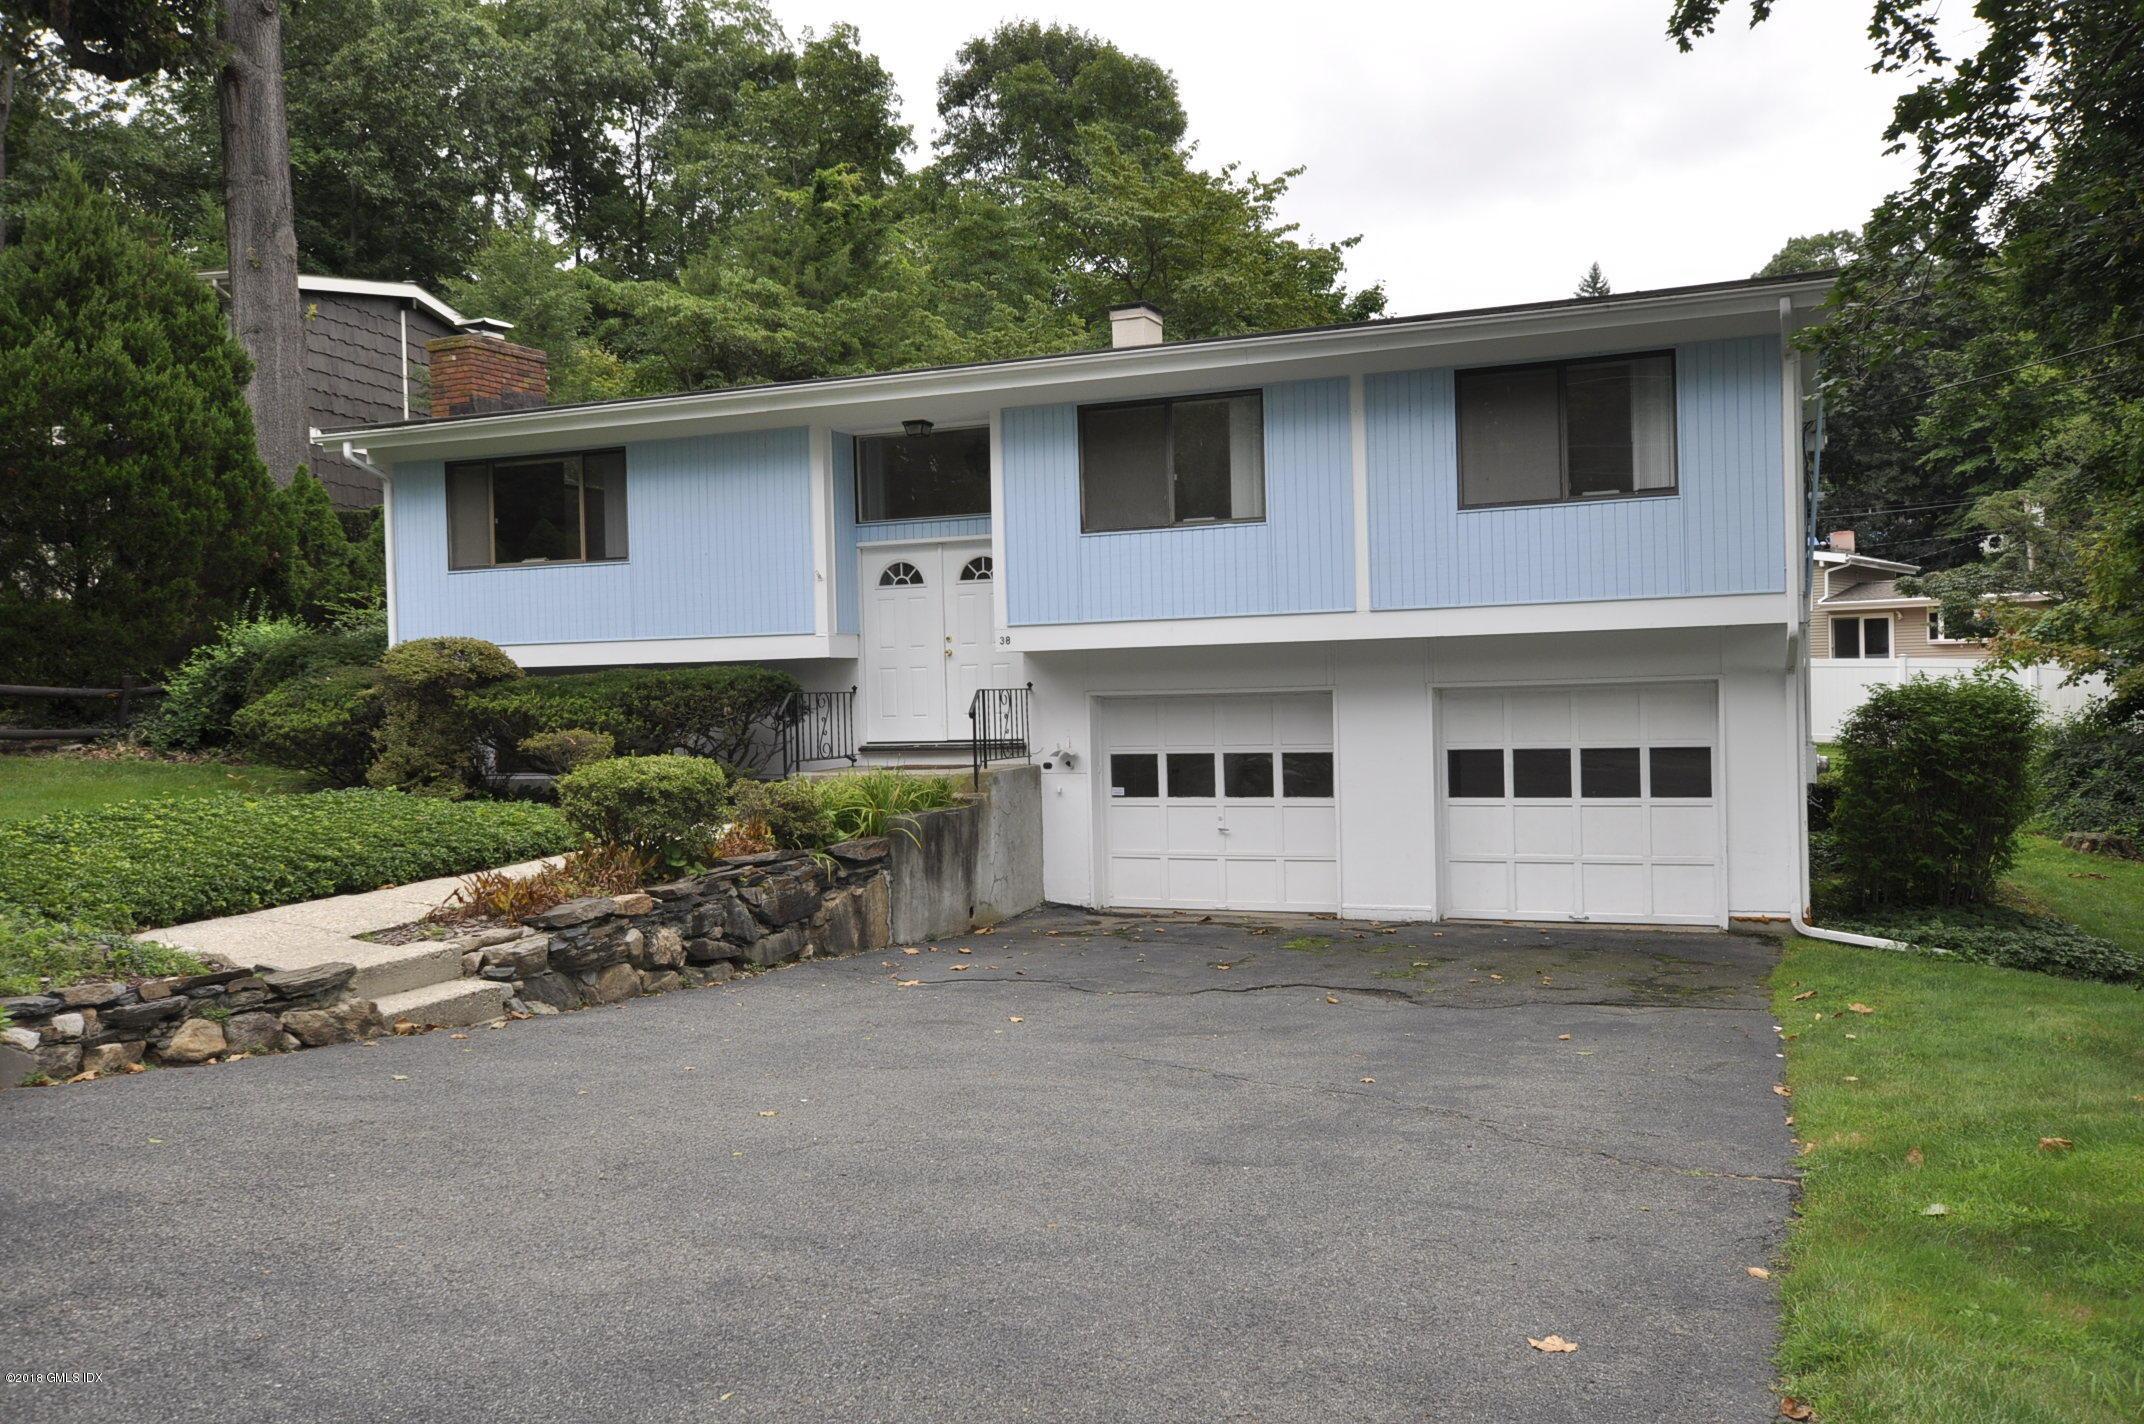 38 Crawford Terrace, Riverside, CT 06878